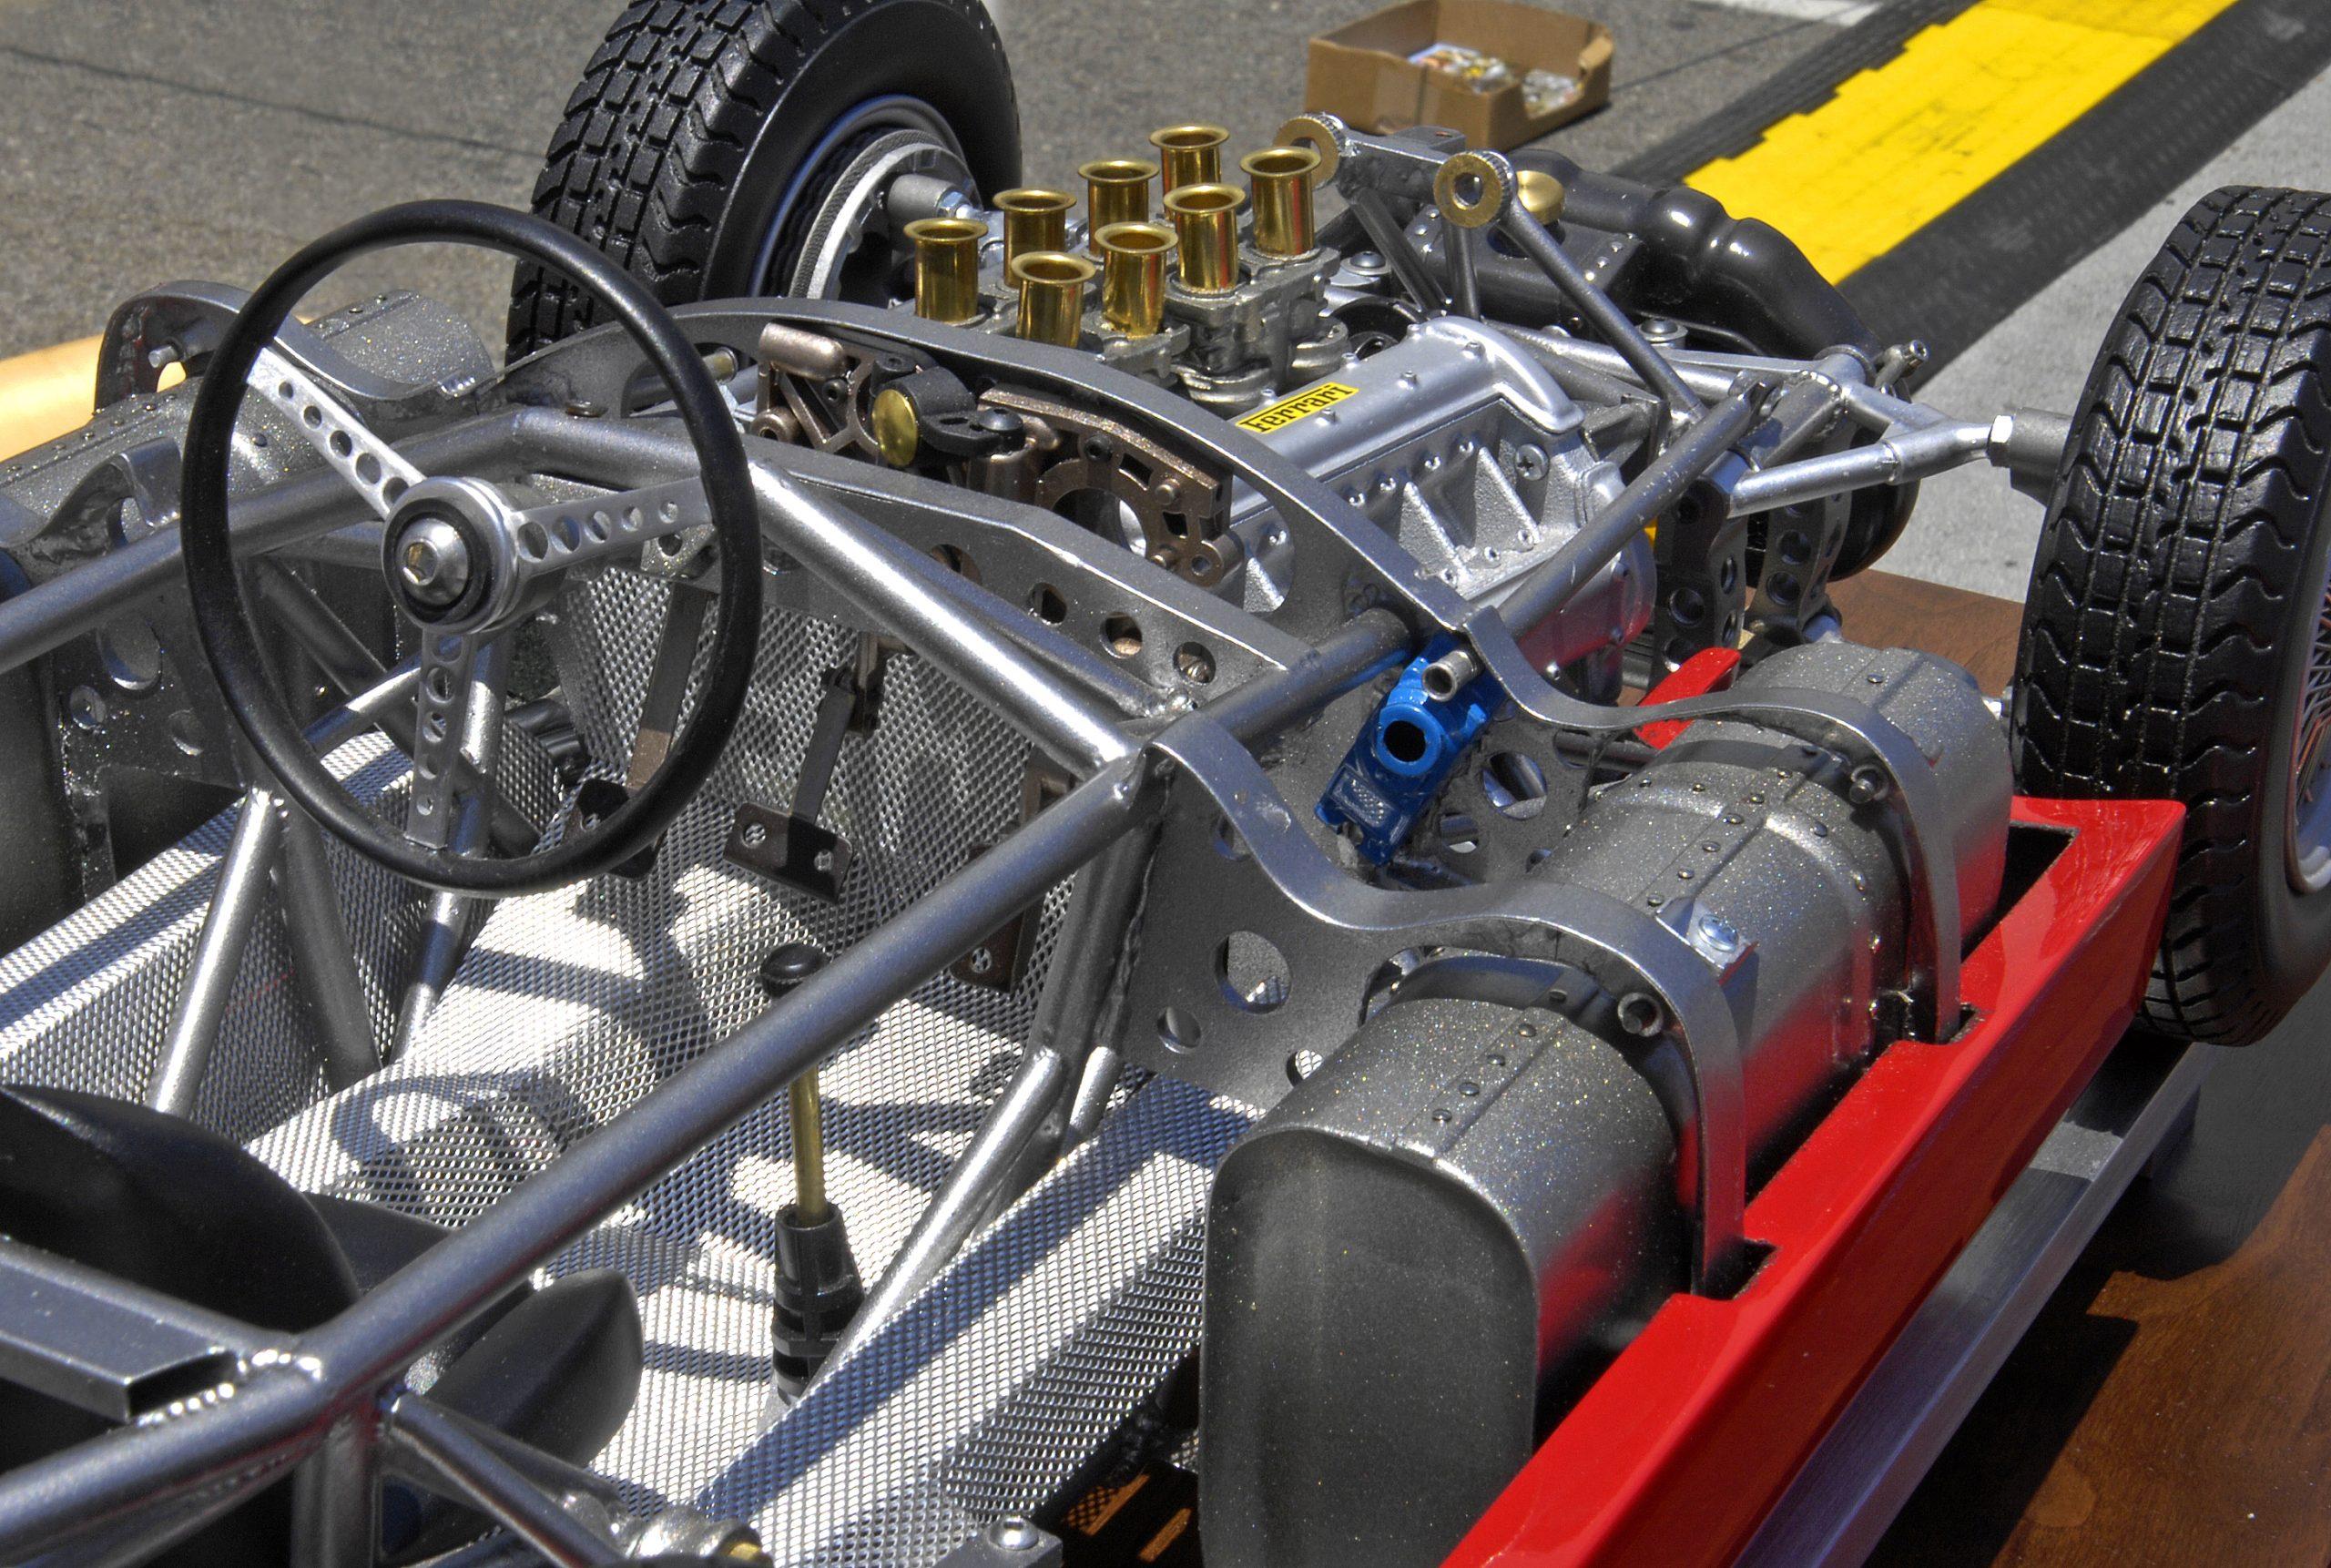 ferrari scale model engine chassis